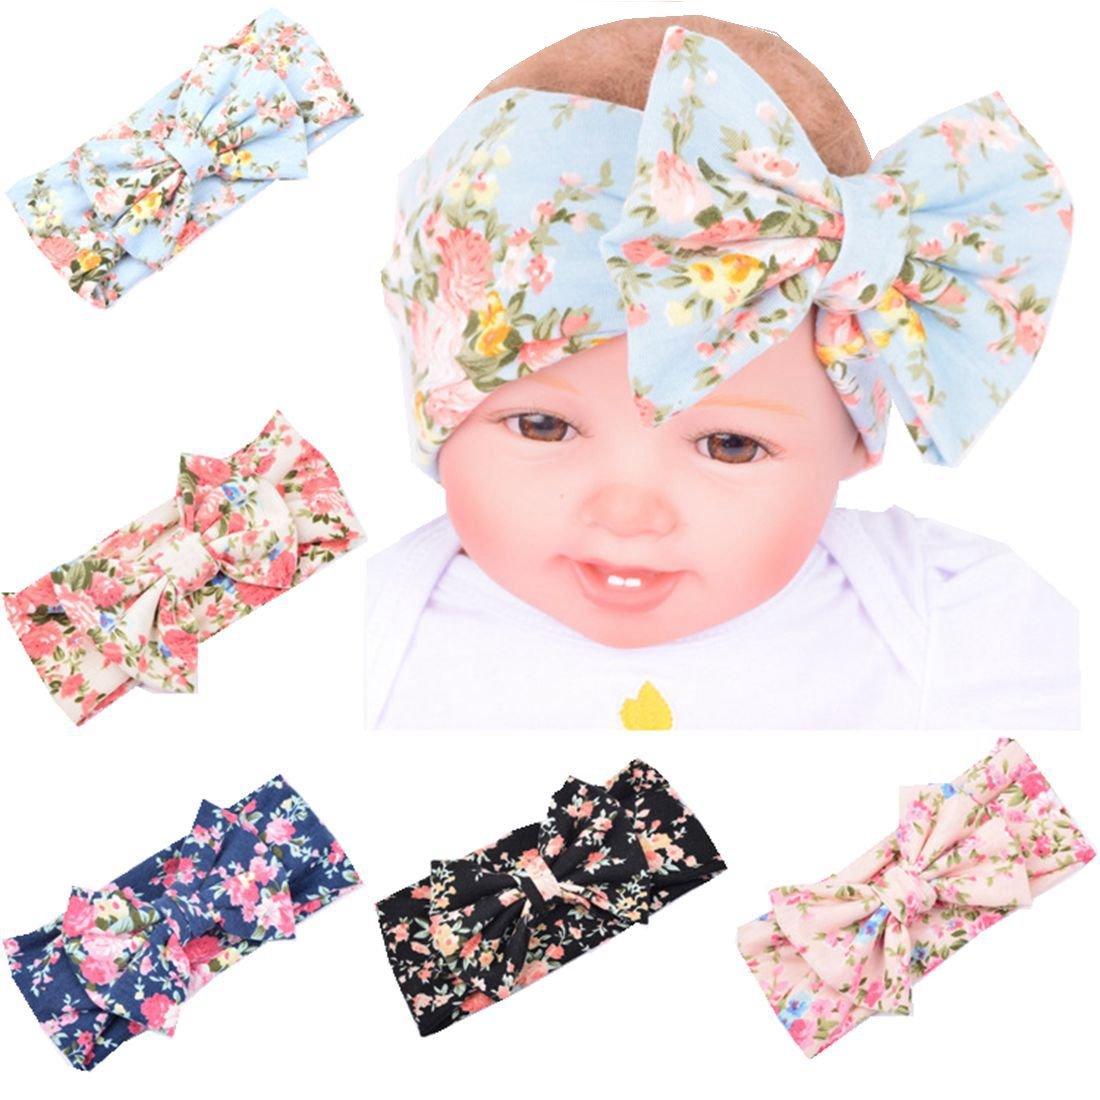 Baby Girl Headband with Big Bowknot Soft Girls' Head Wrap Turban Baby Headband Yzjcafriz